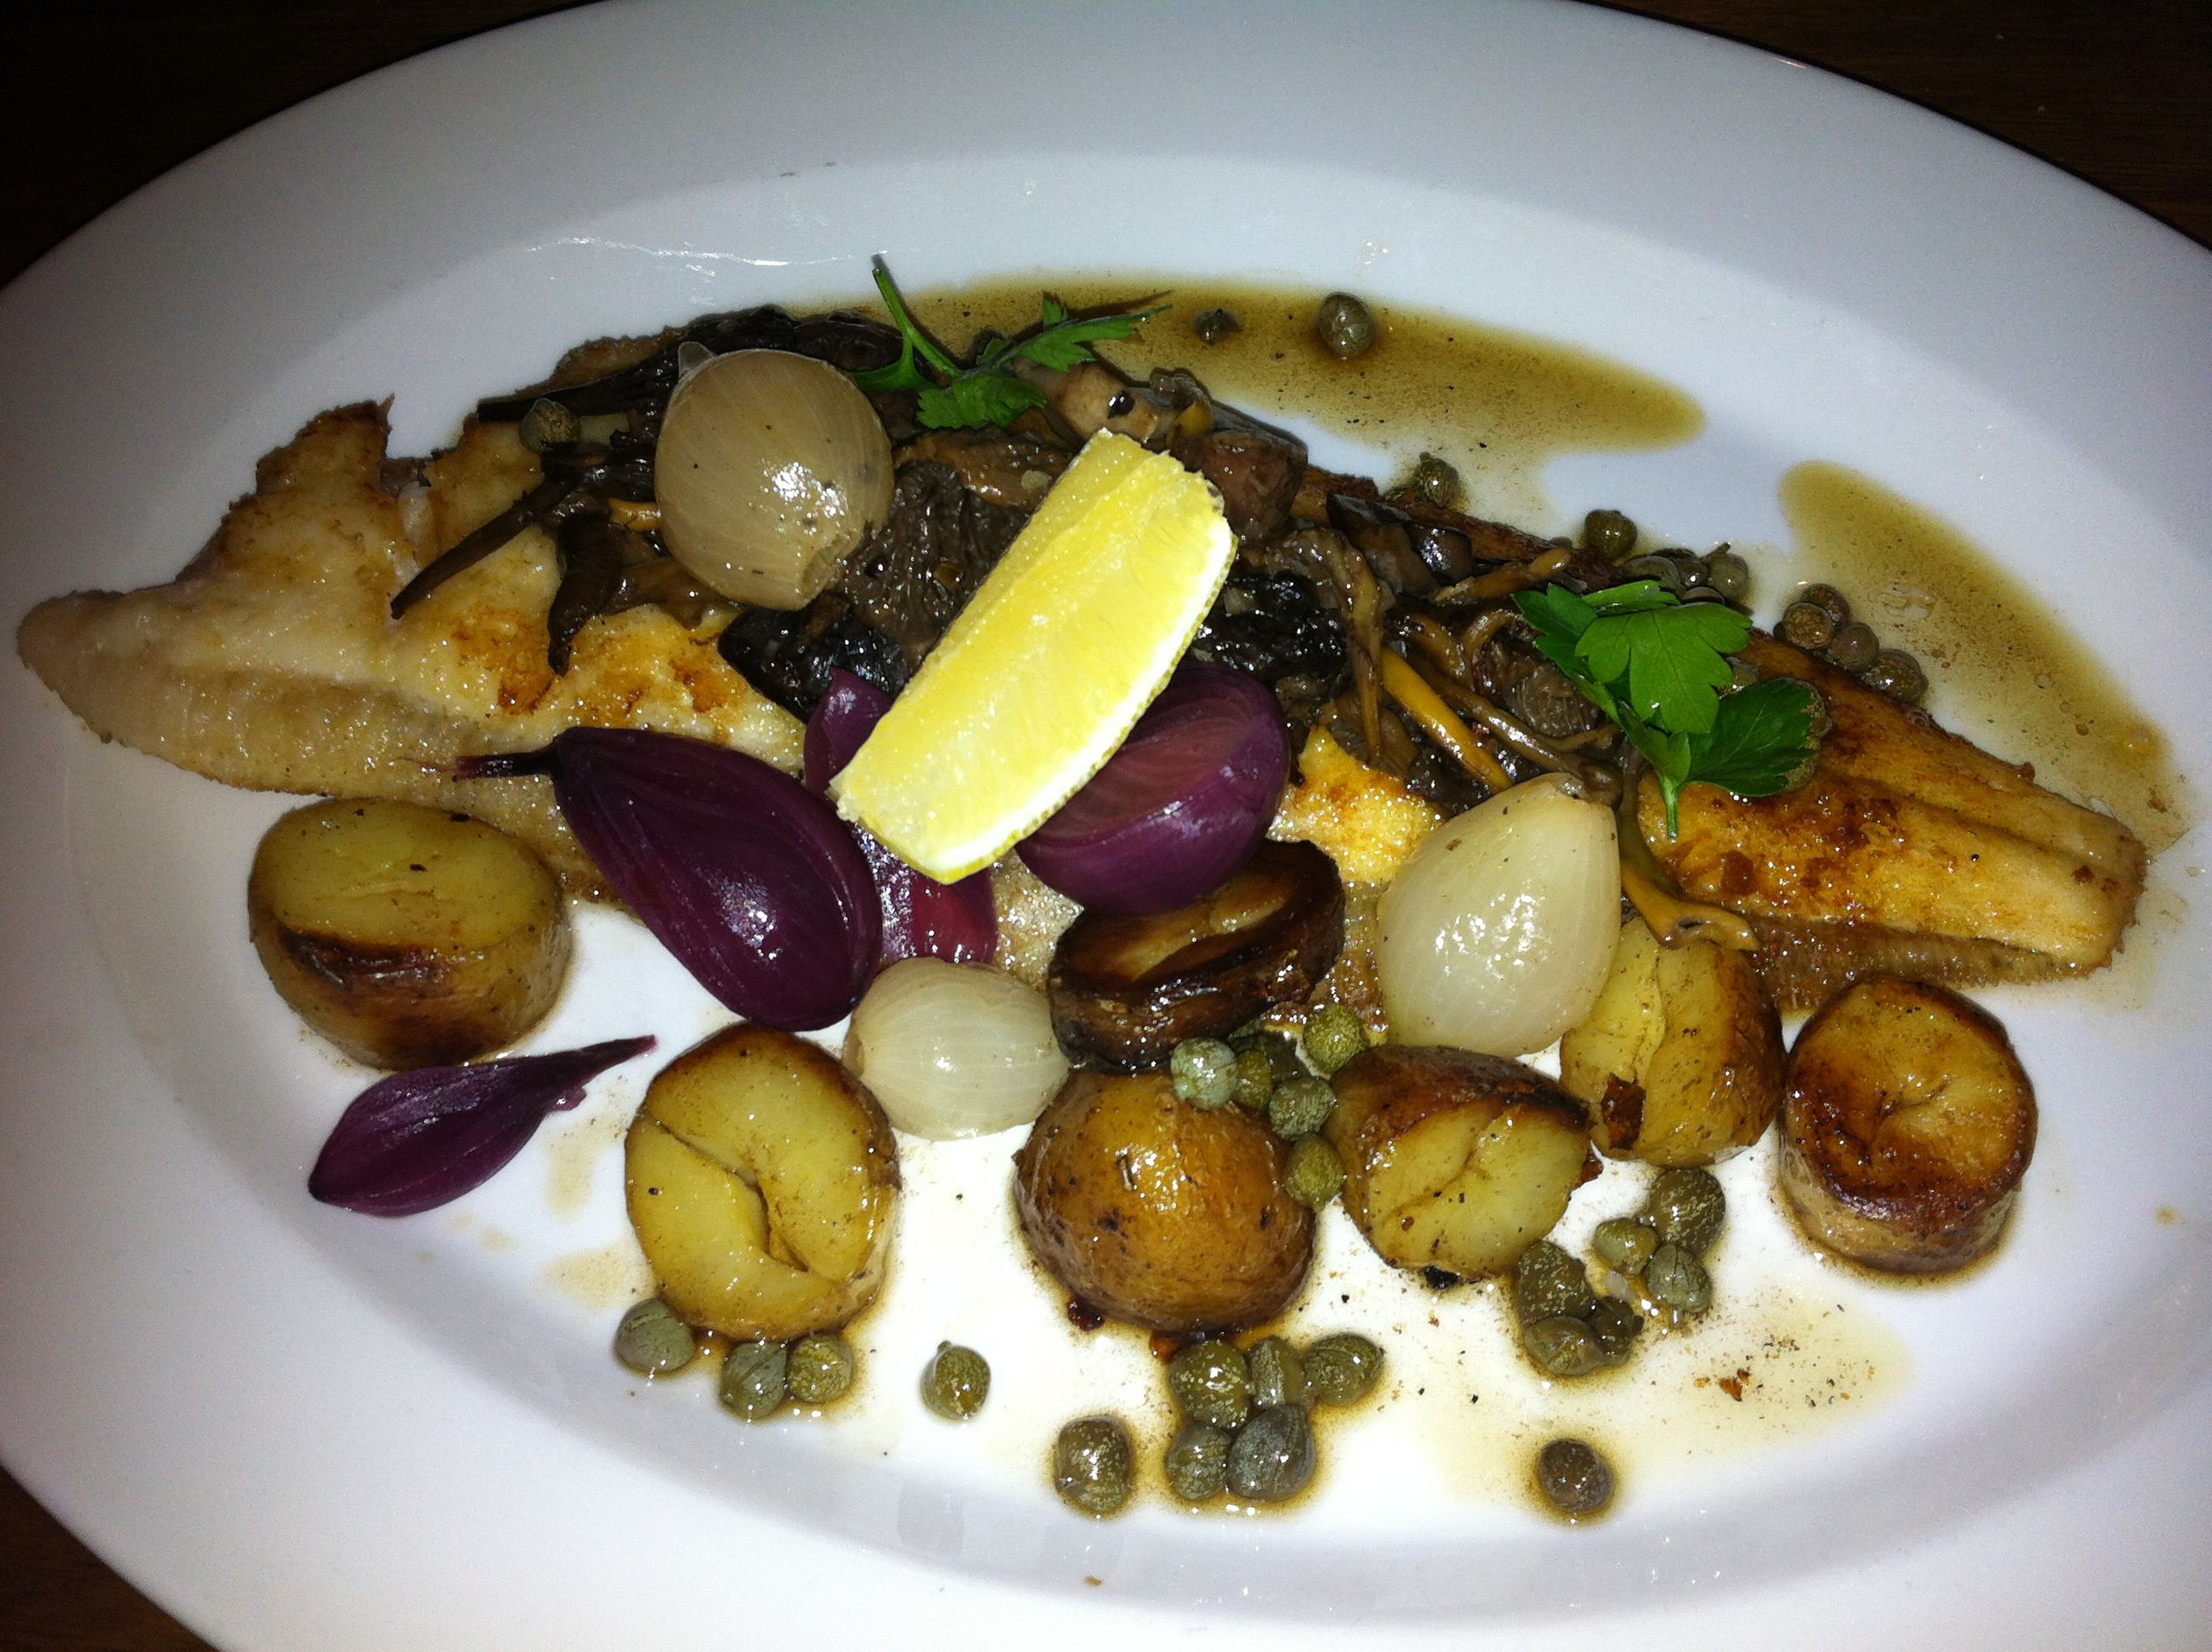 Sole a la Meuniere | Fish Dishes | Pinterest